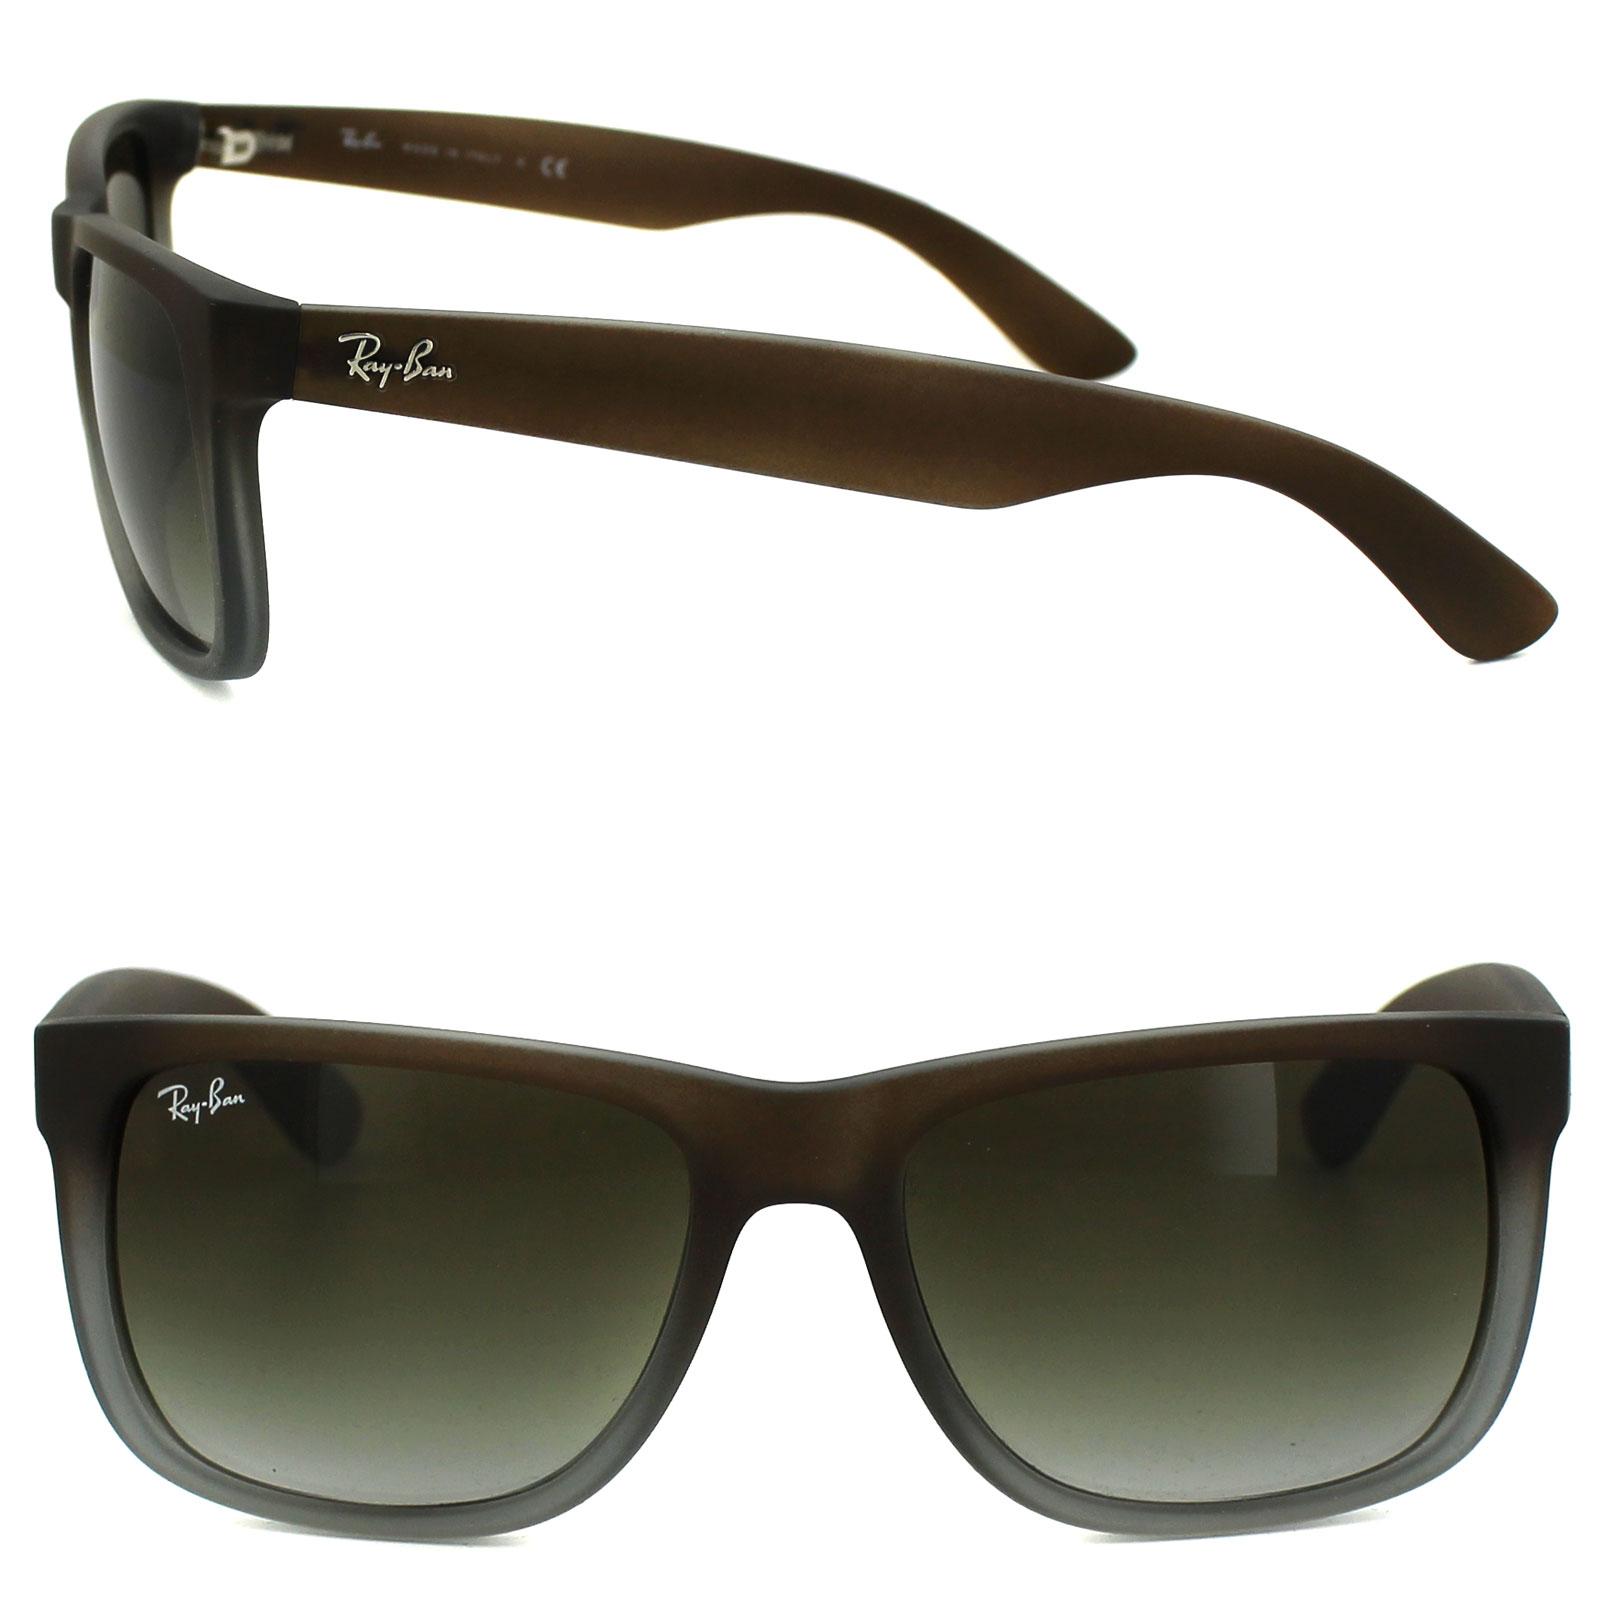 b7fa1b4430 Sentinel Rayban Sunglasses 4165 Rubber Brown On Grey Green Gradient 854 7Z